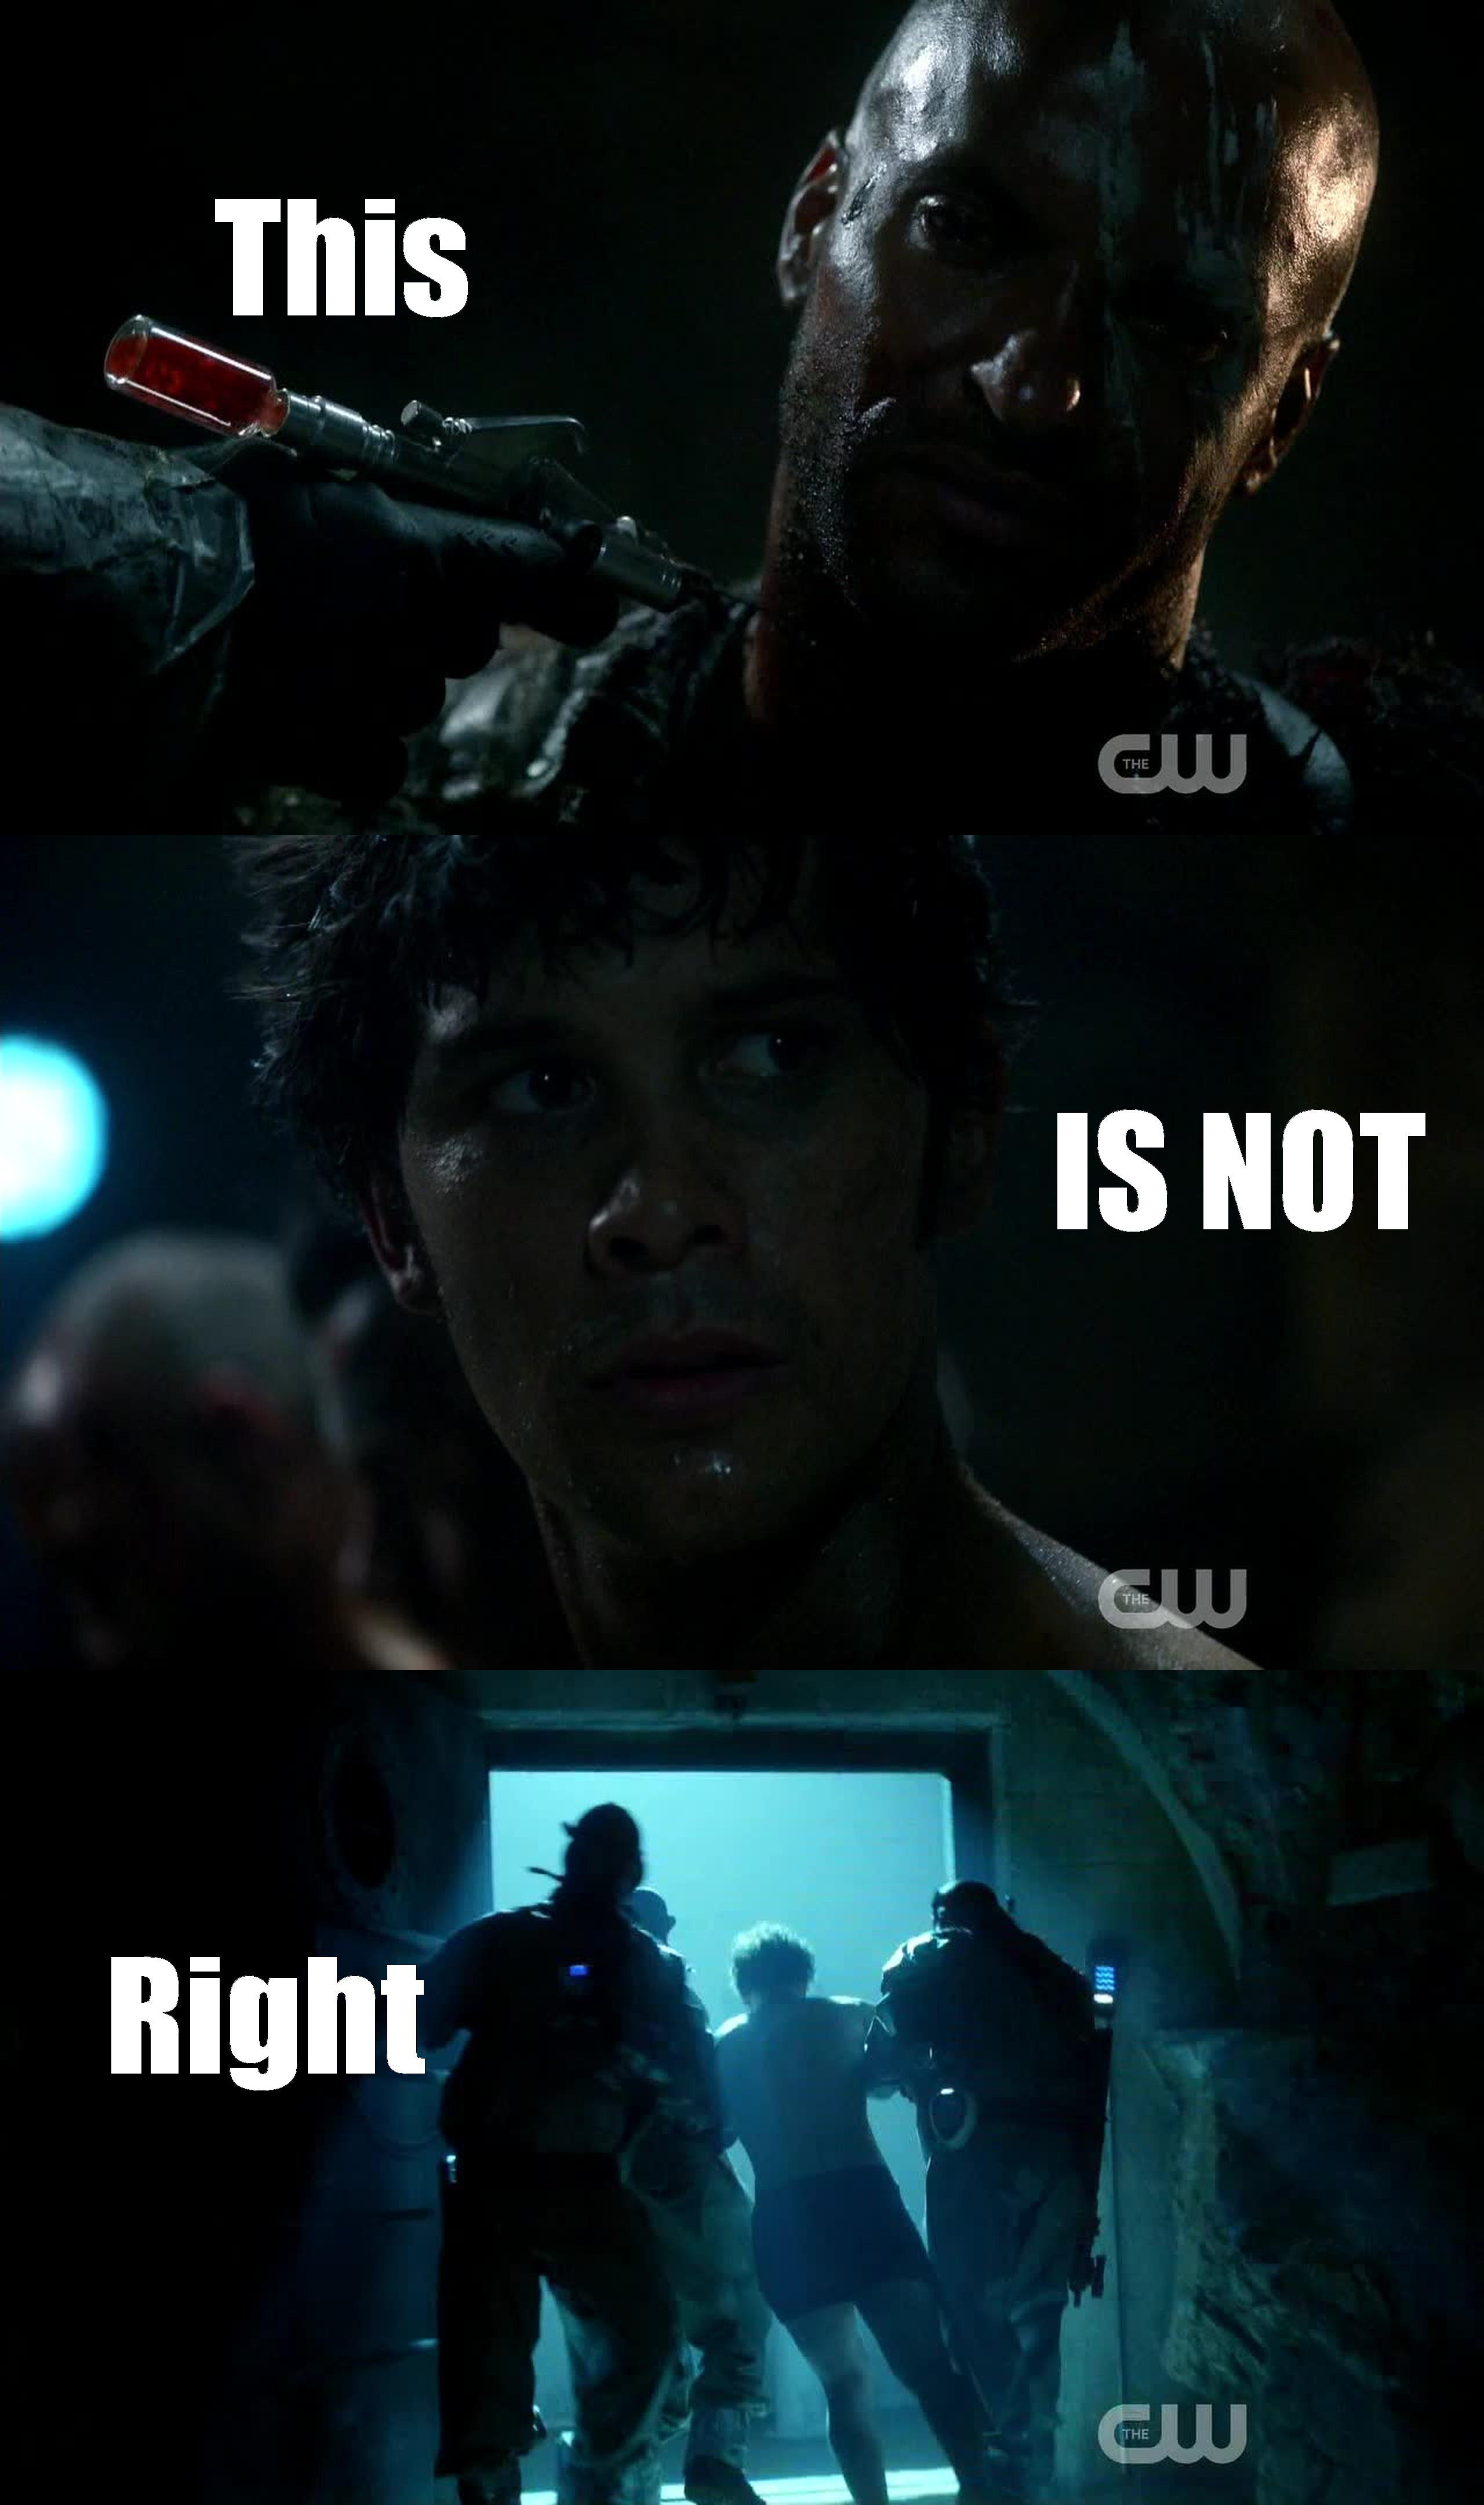 Don't you dare hurt bellamy!! :|